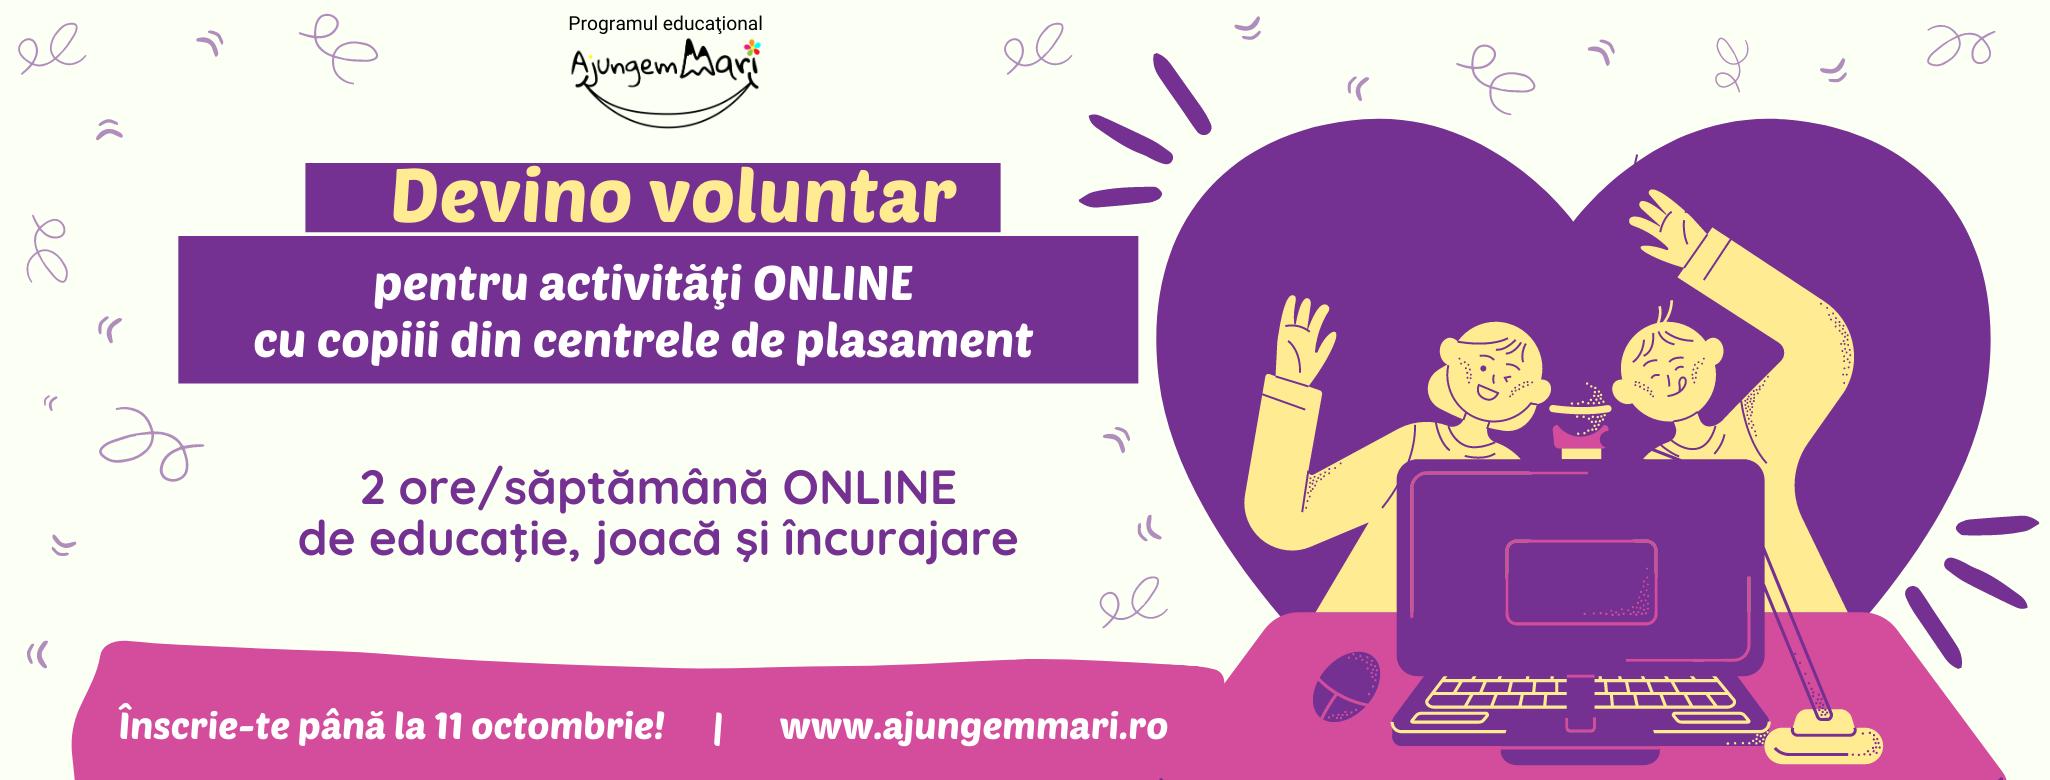 Cover-Devino-voluntar-ONLINE